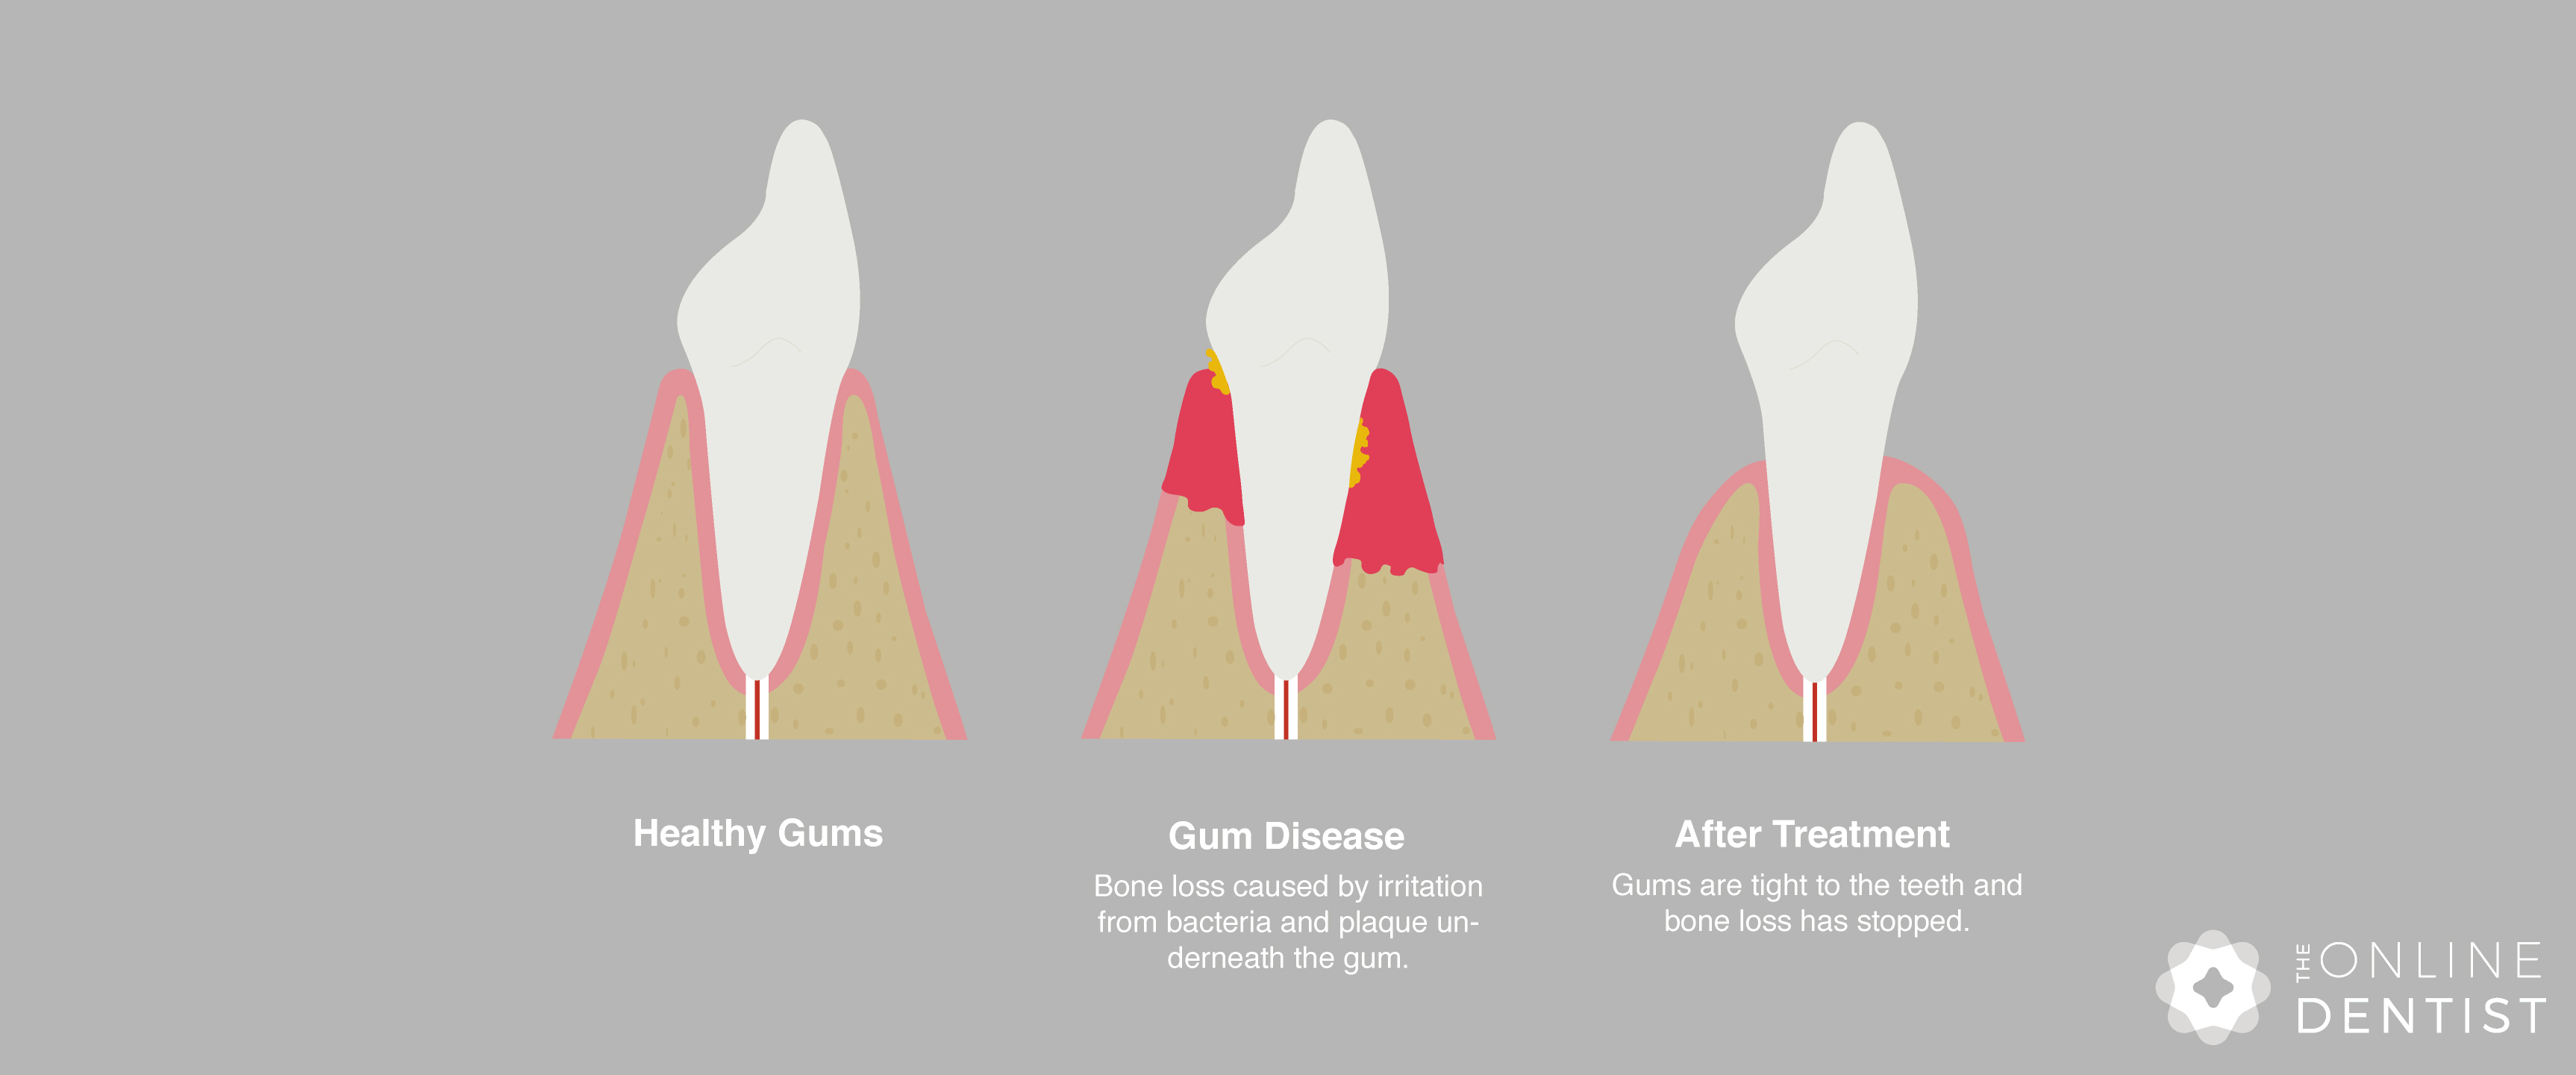 Aggressive Gum Disease Article The Online Dentist